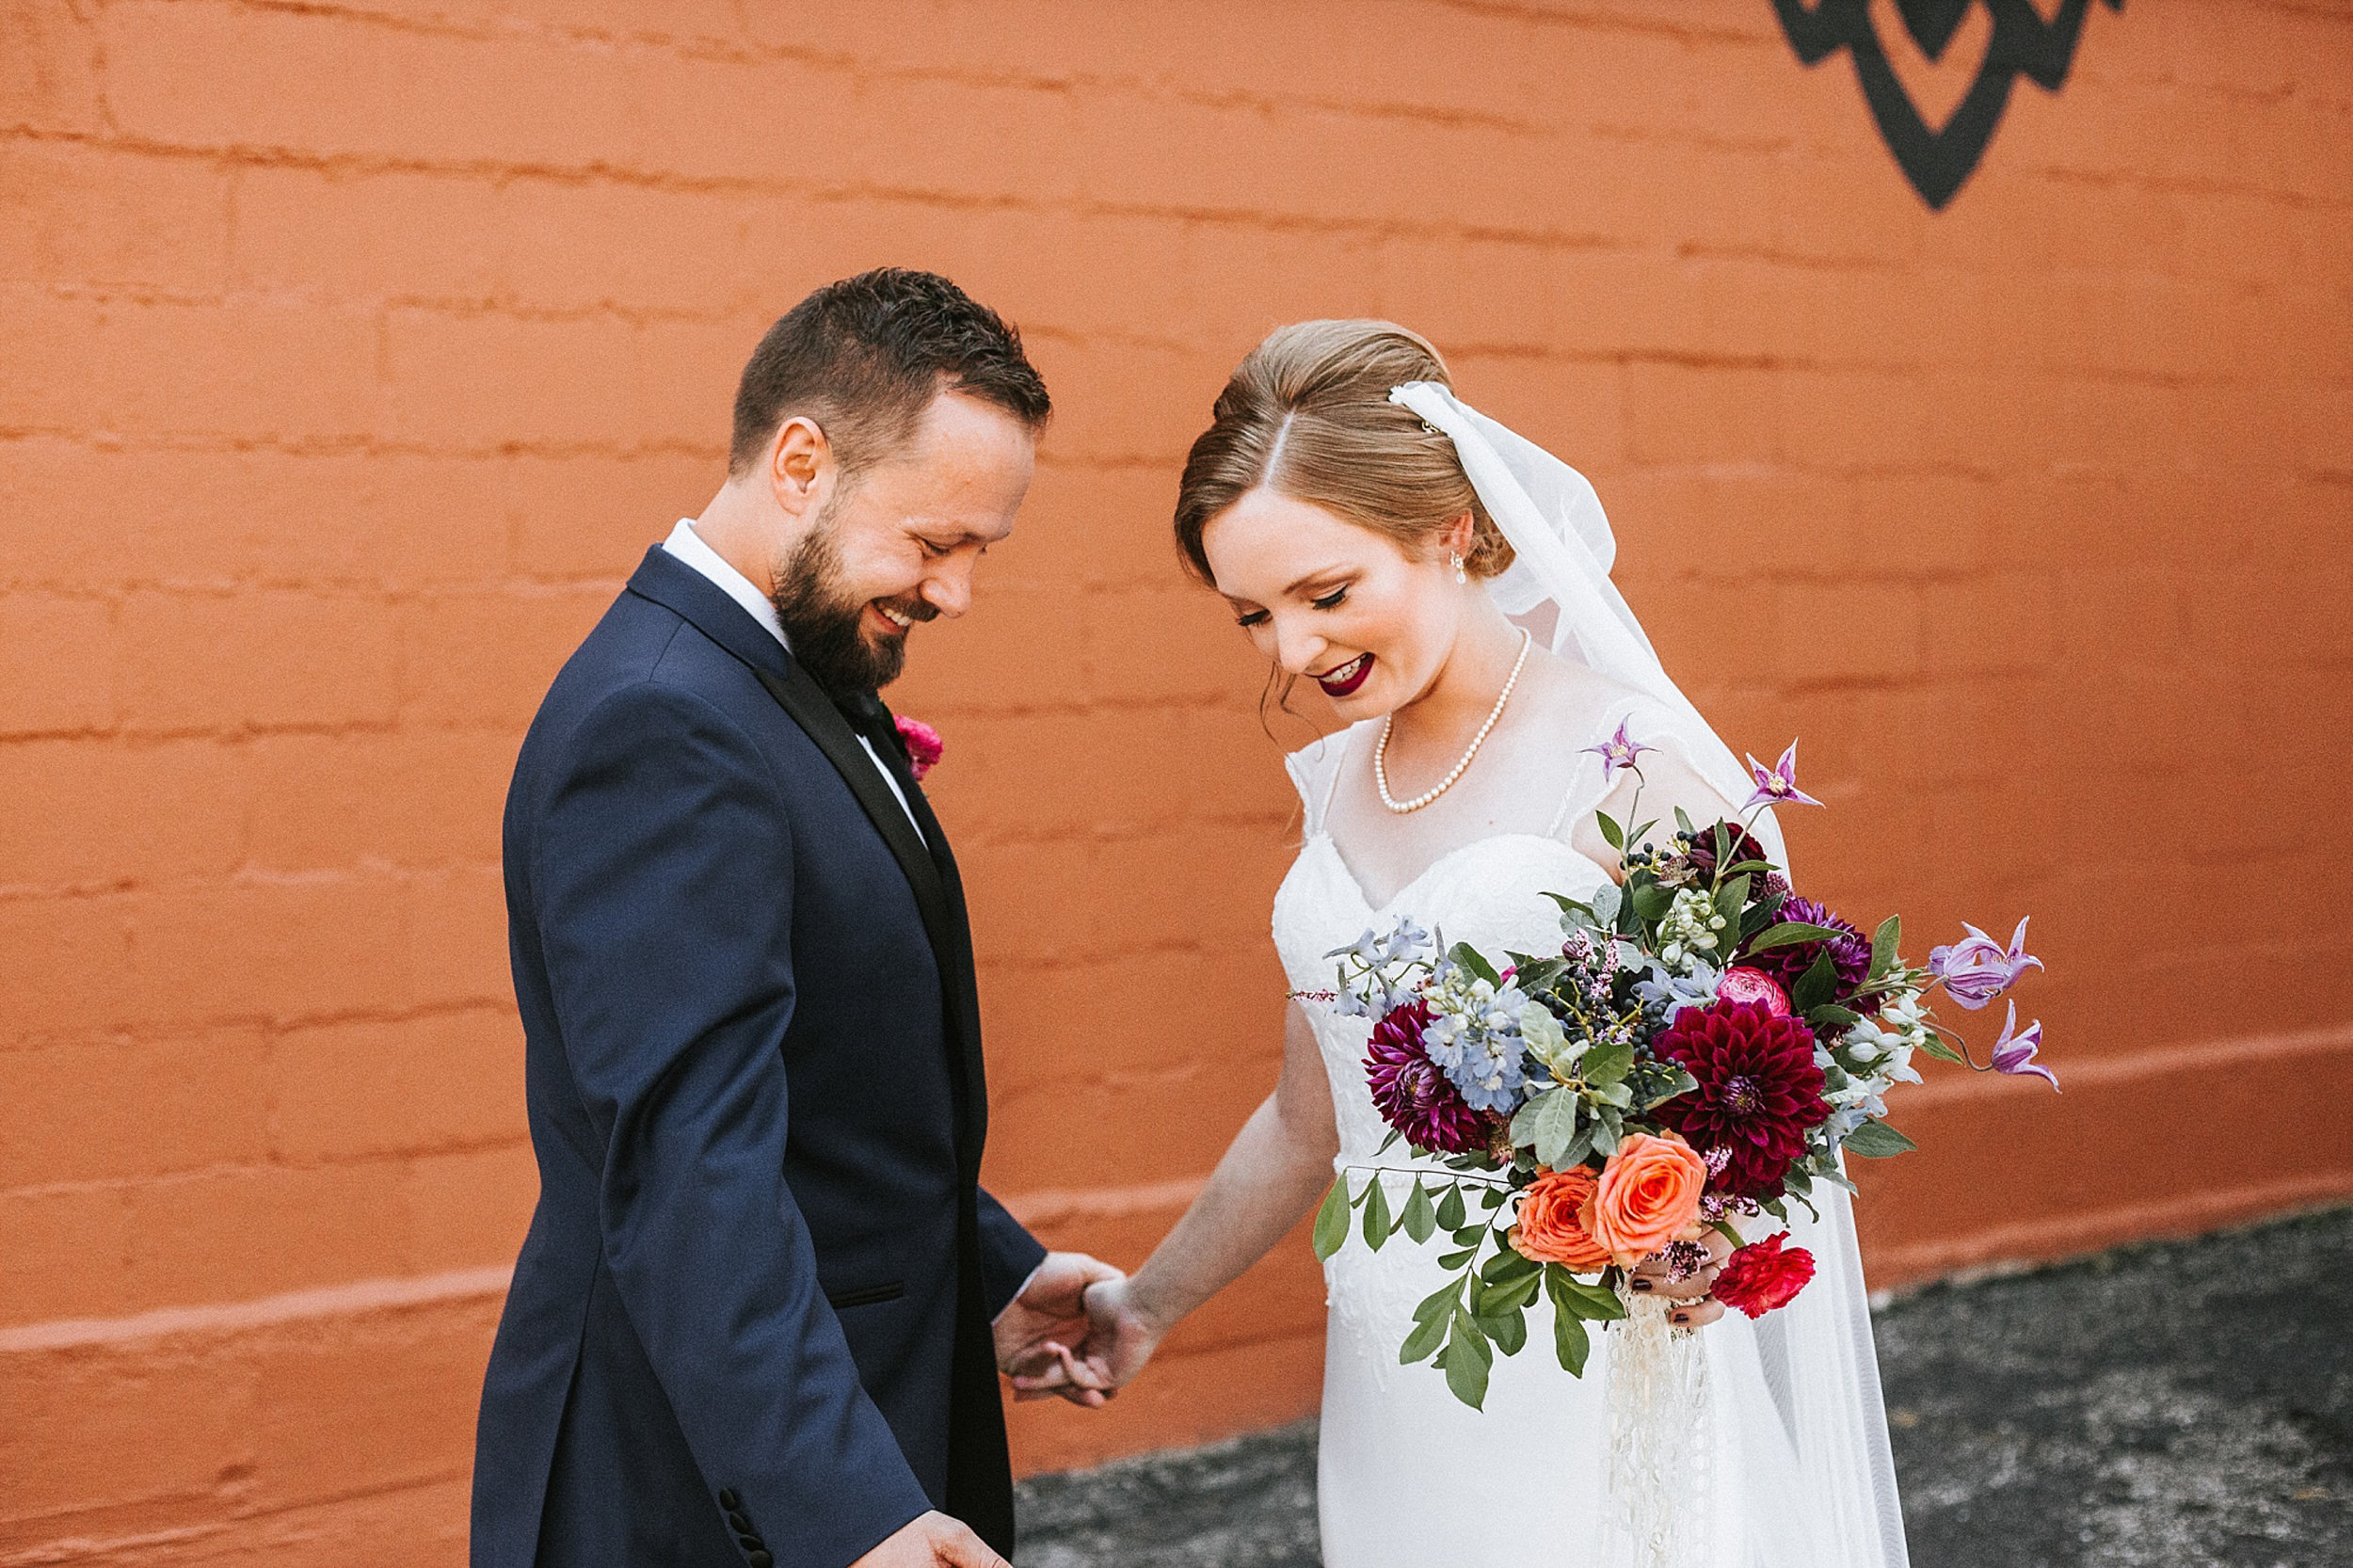 Brooke Townsend Photography - Ohio Wedding Photographer-46.jpg